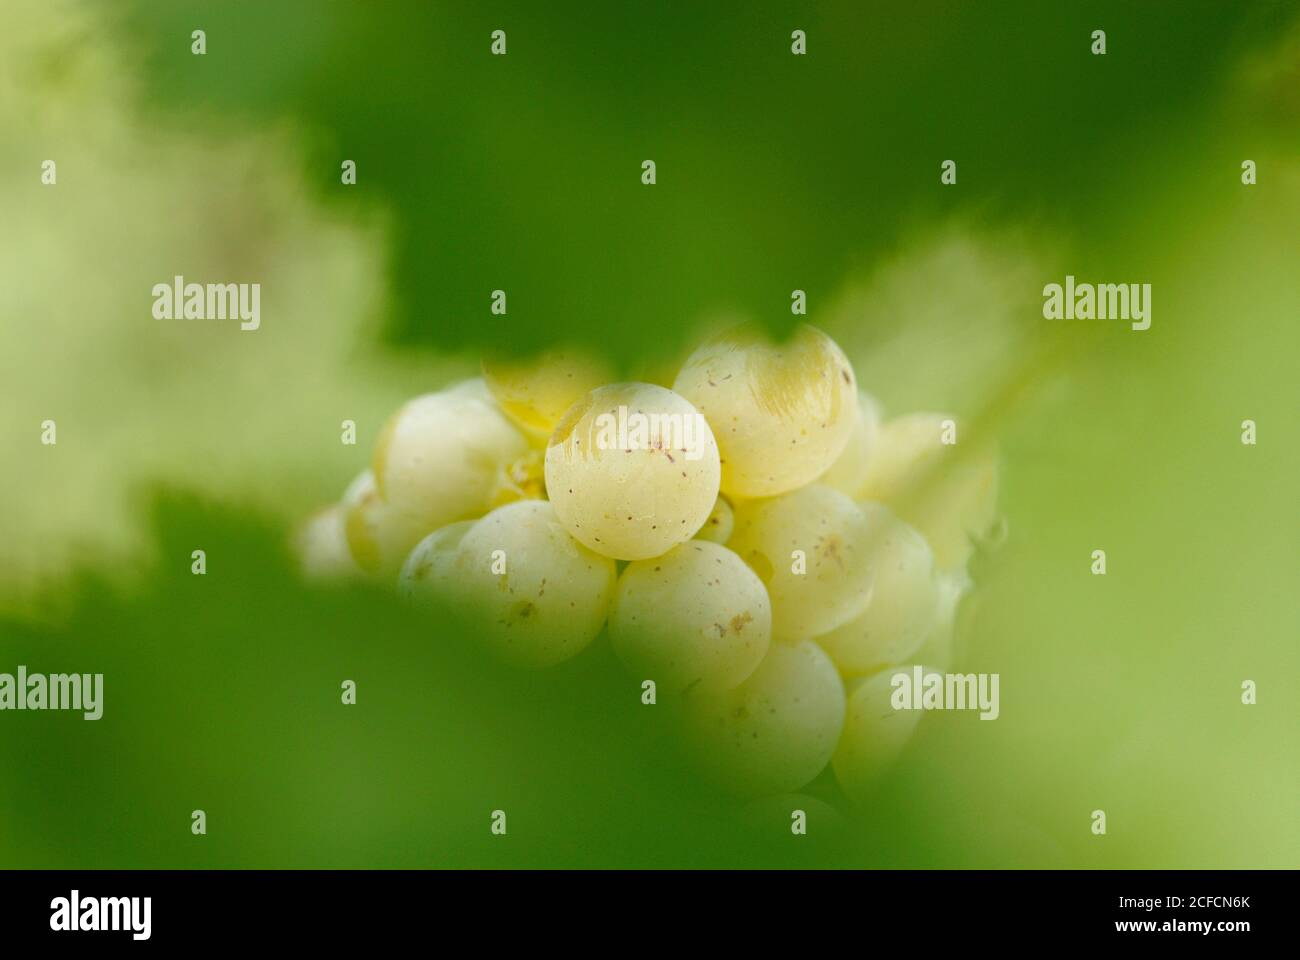 Italy, Trentino-South Tyrol, Alto Adige, Alto Adige, Terlan / Terlano, viticulture, Winkl, Weintraube Sauvignon, details Stock Photo